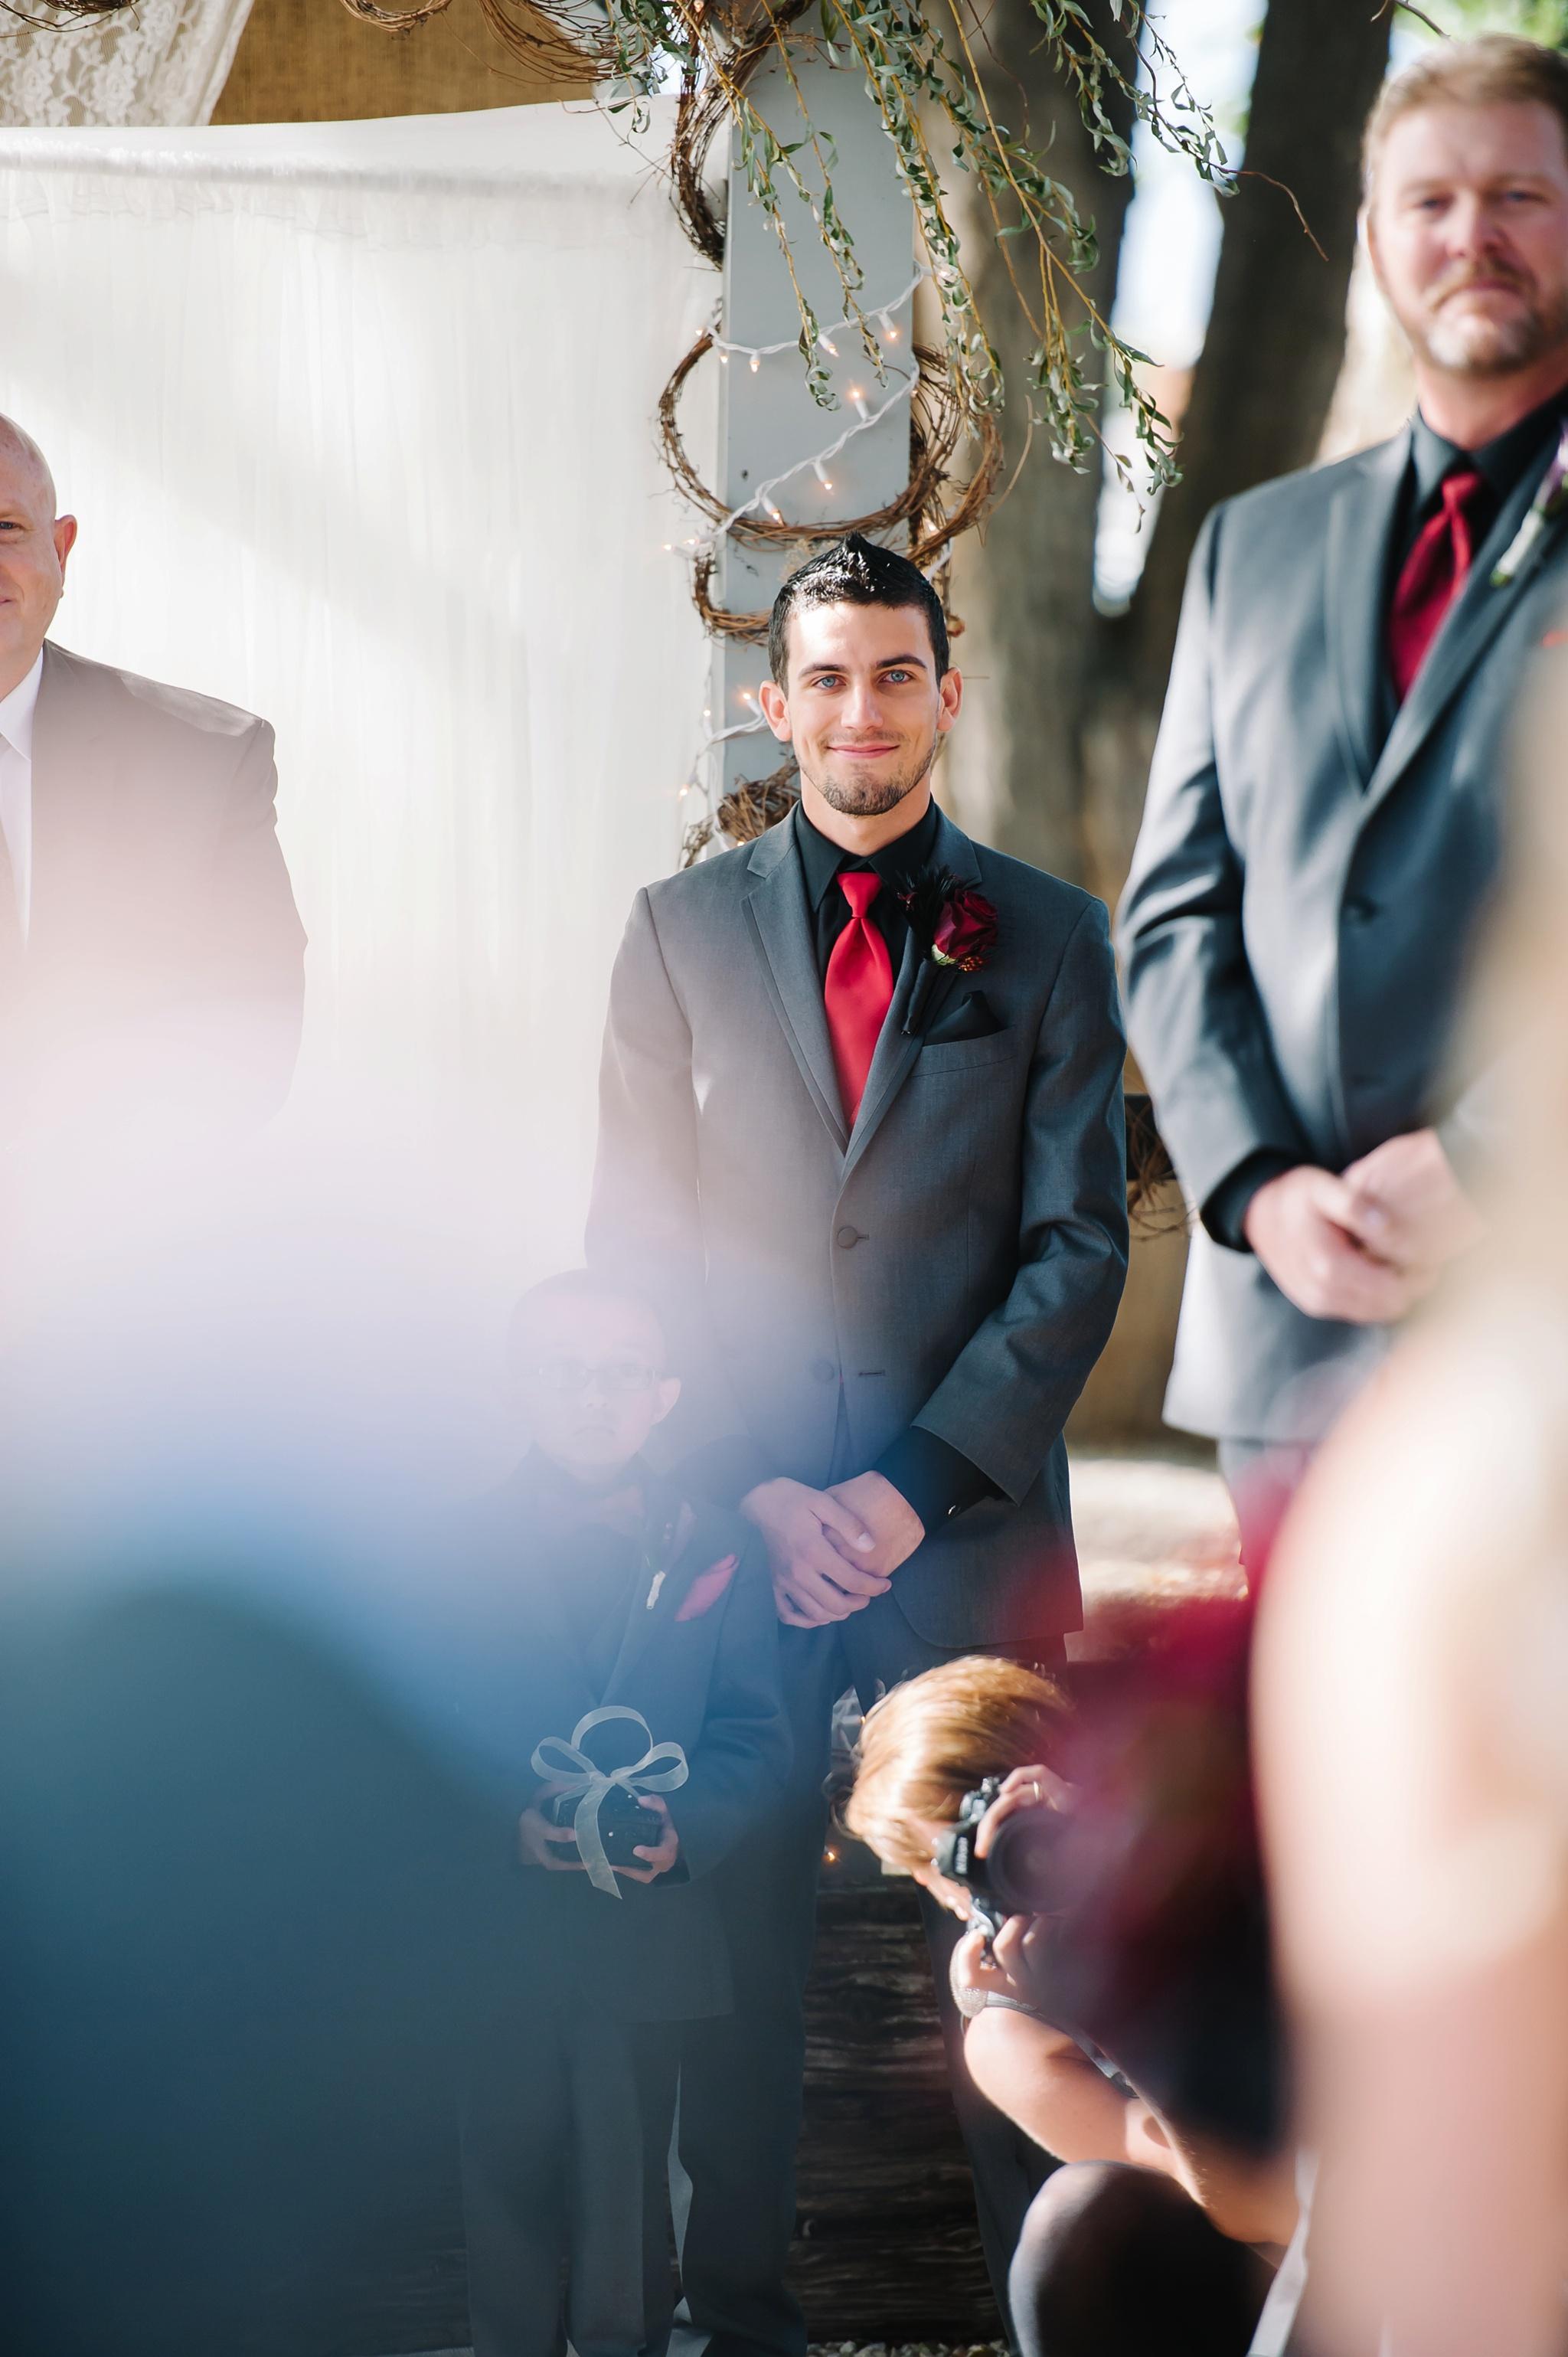 SLC Utah Wedding Photographer Ali Sumsion 023